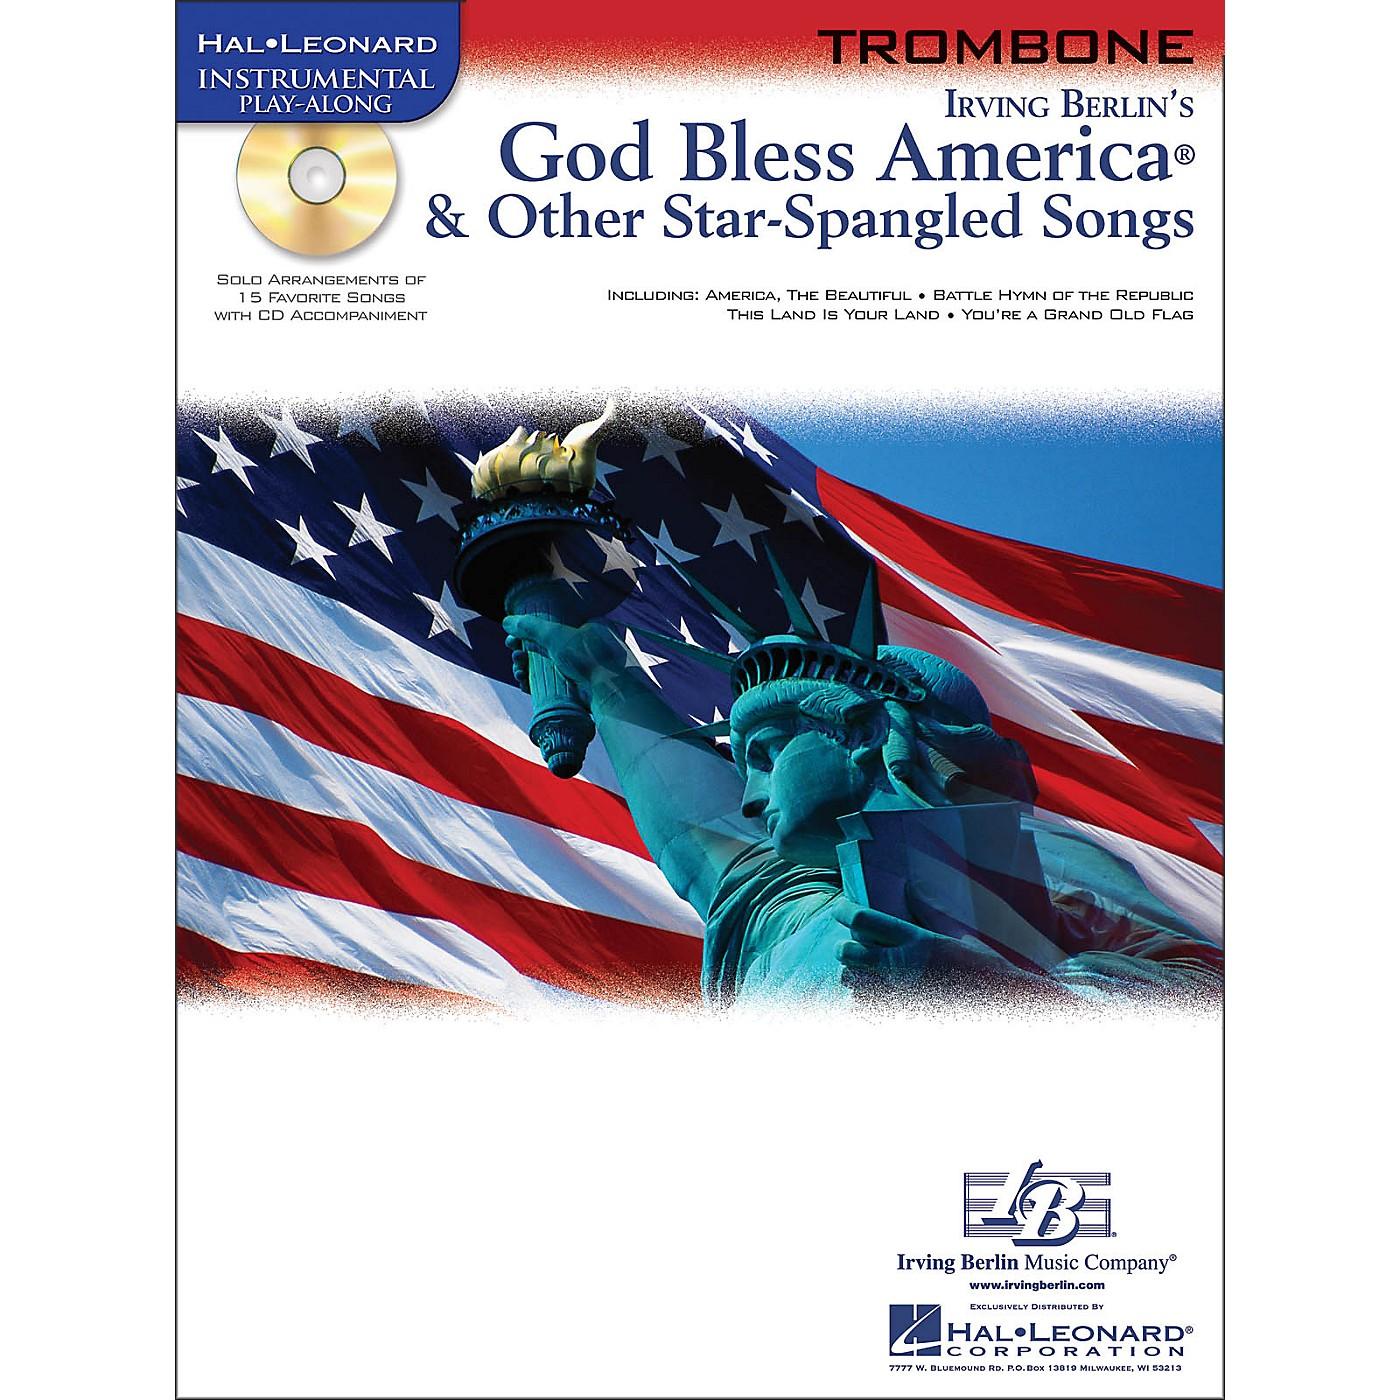 Hal Leonard God Bless America & Other Star Spangled Songs for Trombone instrumental Play-Along Book/CD thumbnail